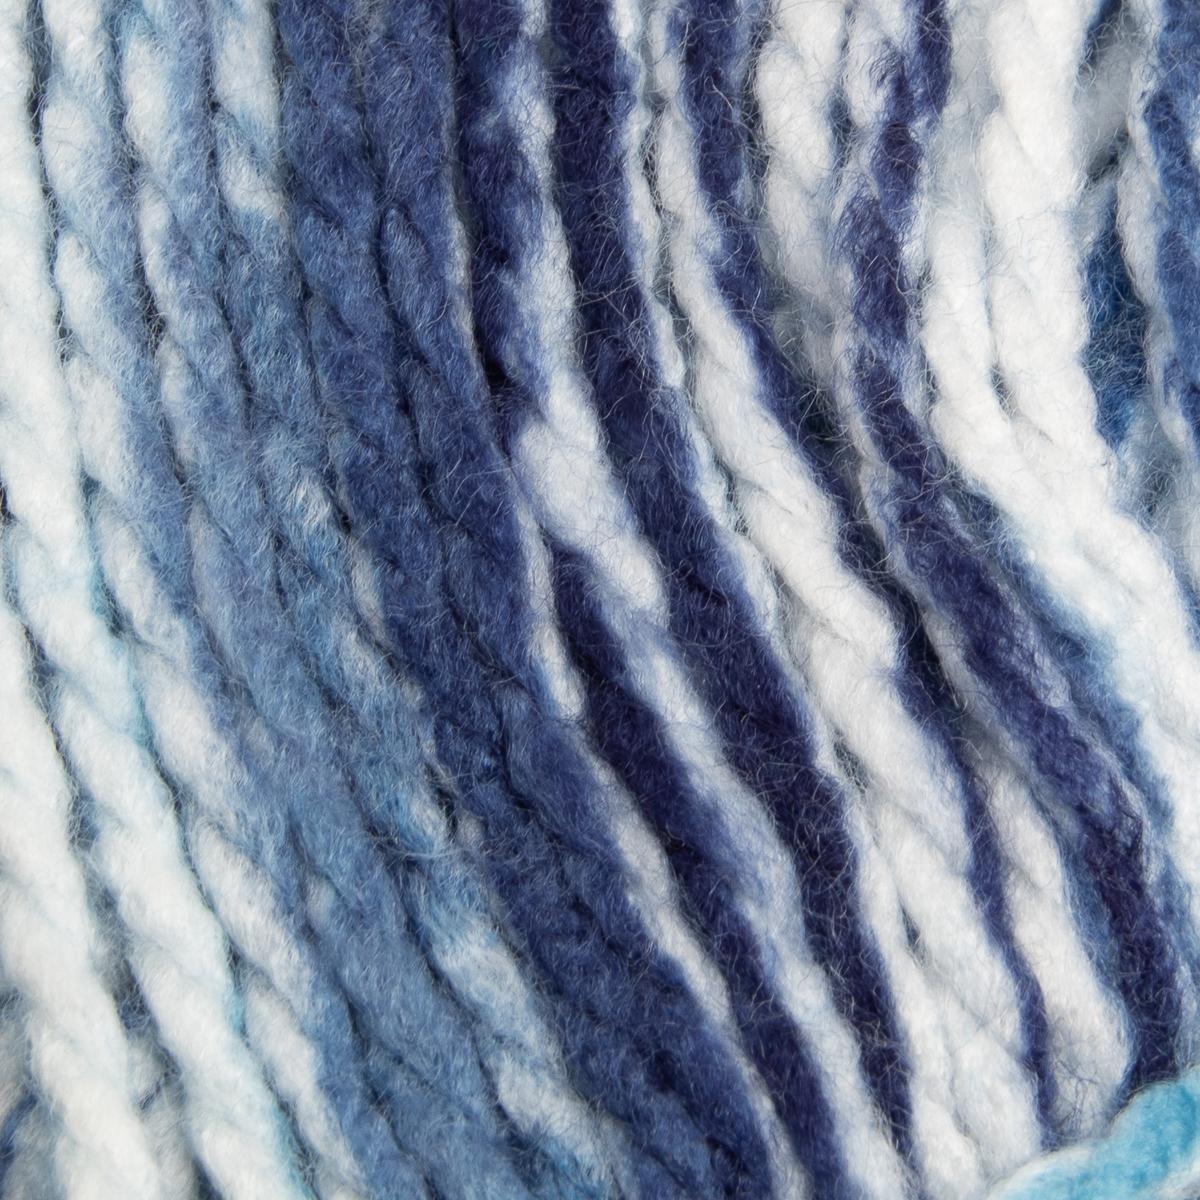 3pk-Premier-Yarns-Deborah-Norville-Serenity-100-Acrylic-Yarn-Chunky-5-Knitting thumbnail 35